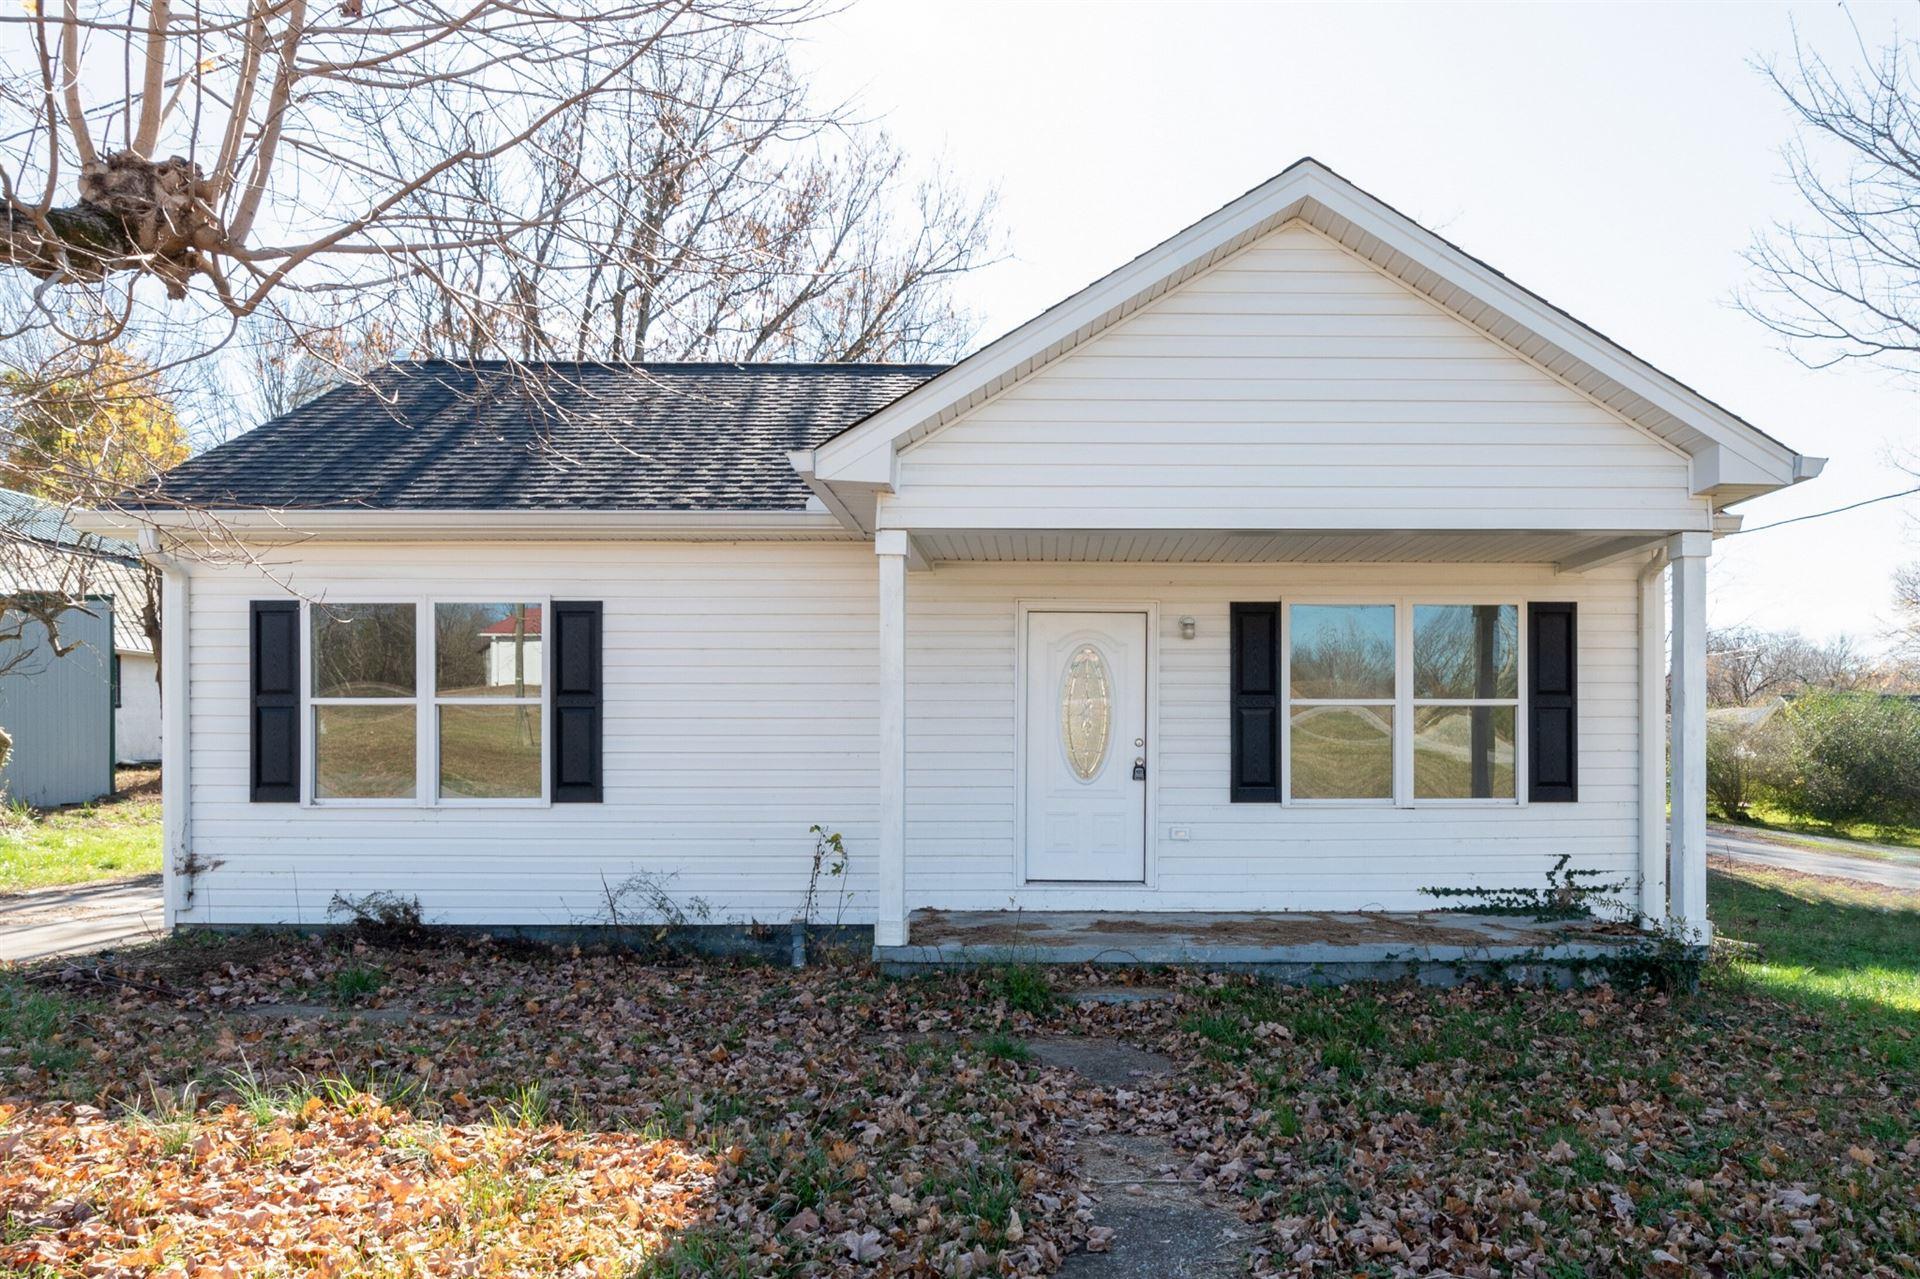 2604 Epperson Springs Rd, Westmoreland, TN 37186 - MLS#: 2207221